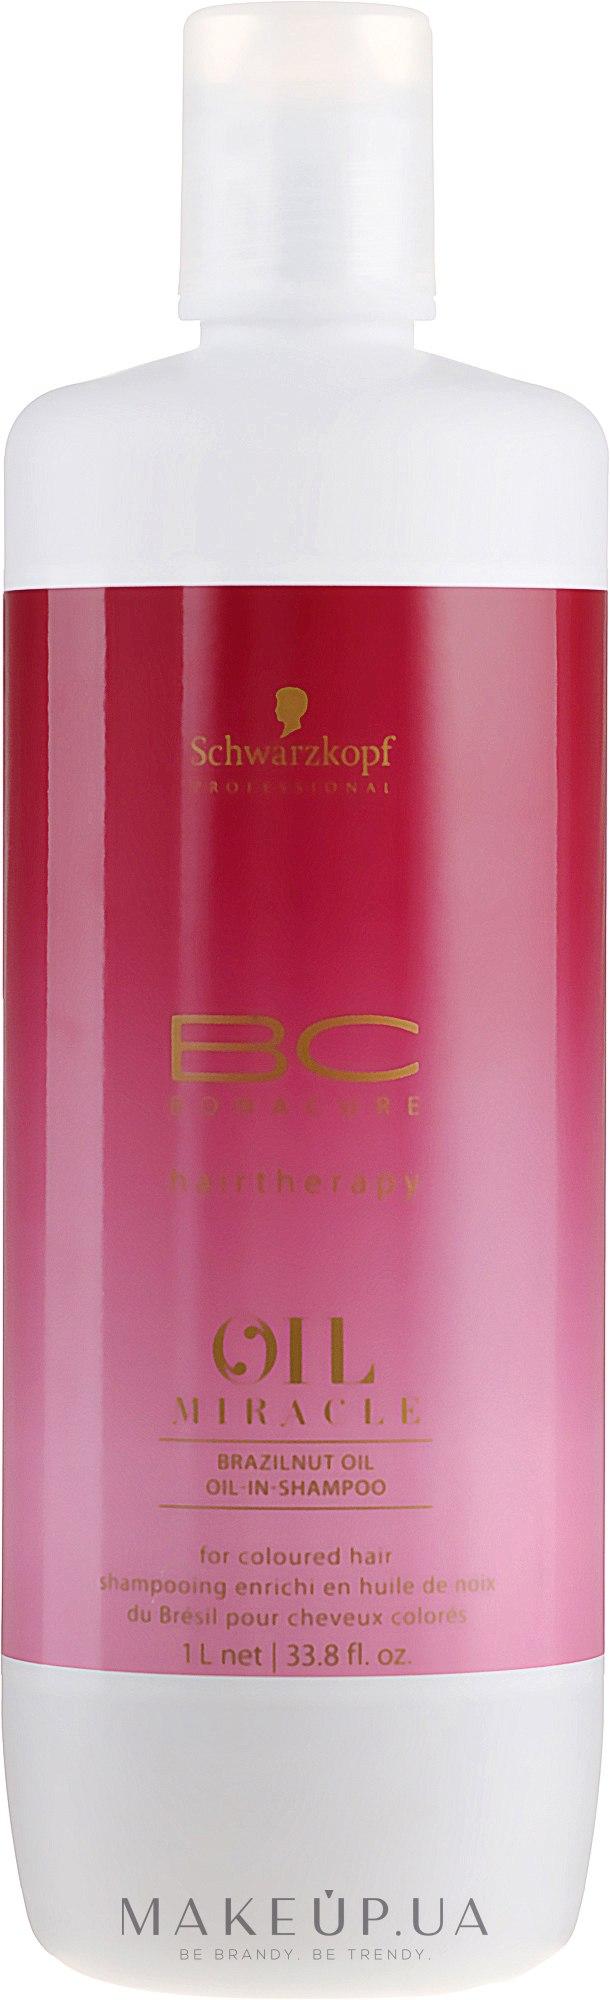 Шампунь для волос с маслом бразильского ореха - Schwarzkopf Professional BC Oil Miracle Brazilnut Oil-in-Shampoo — фото 1000ml